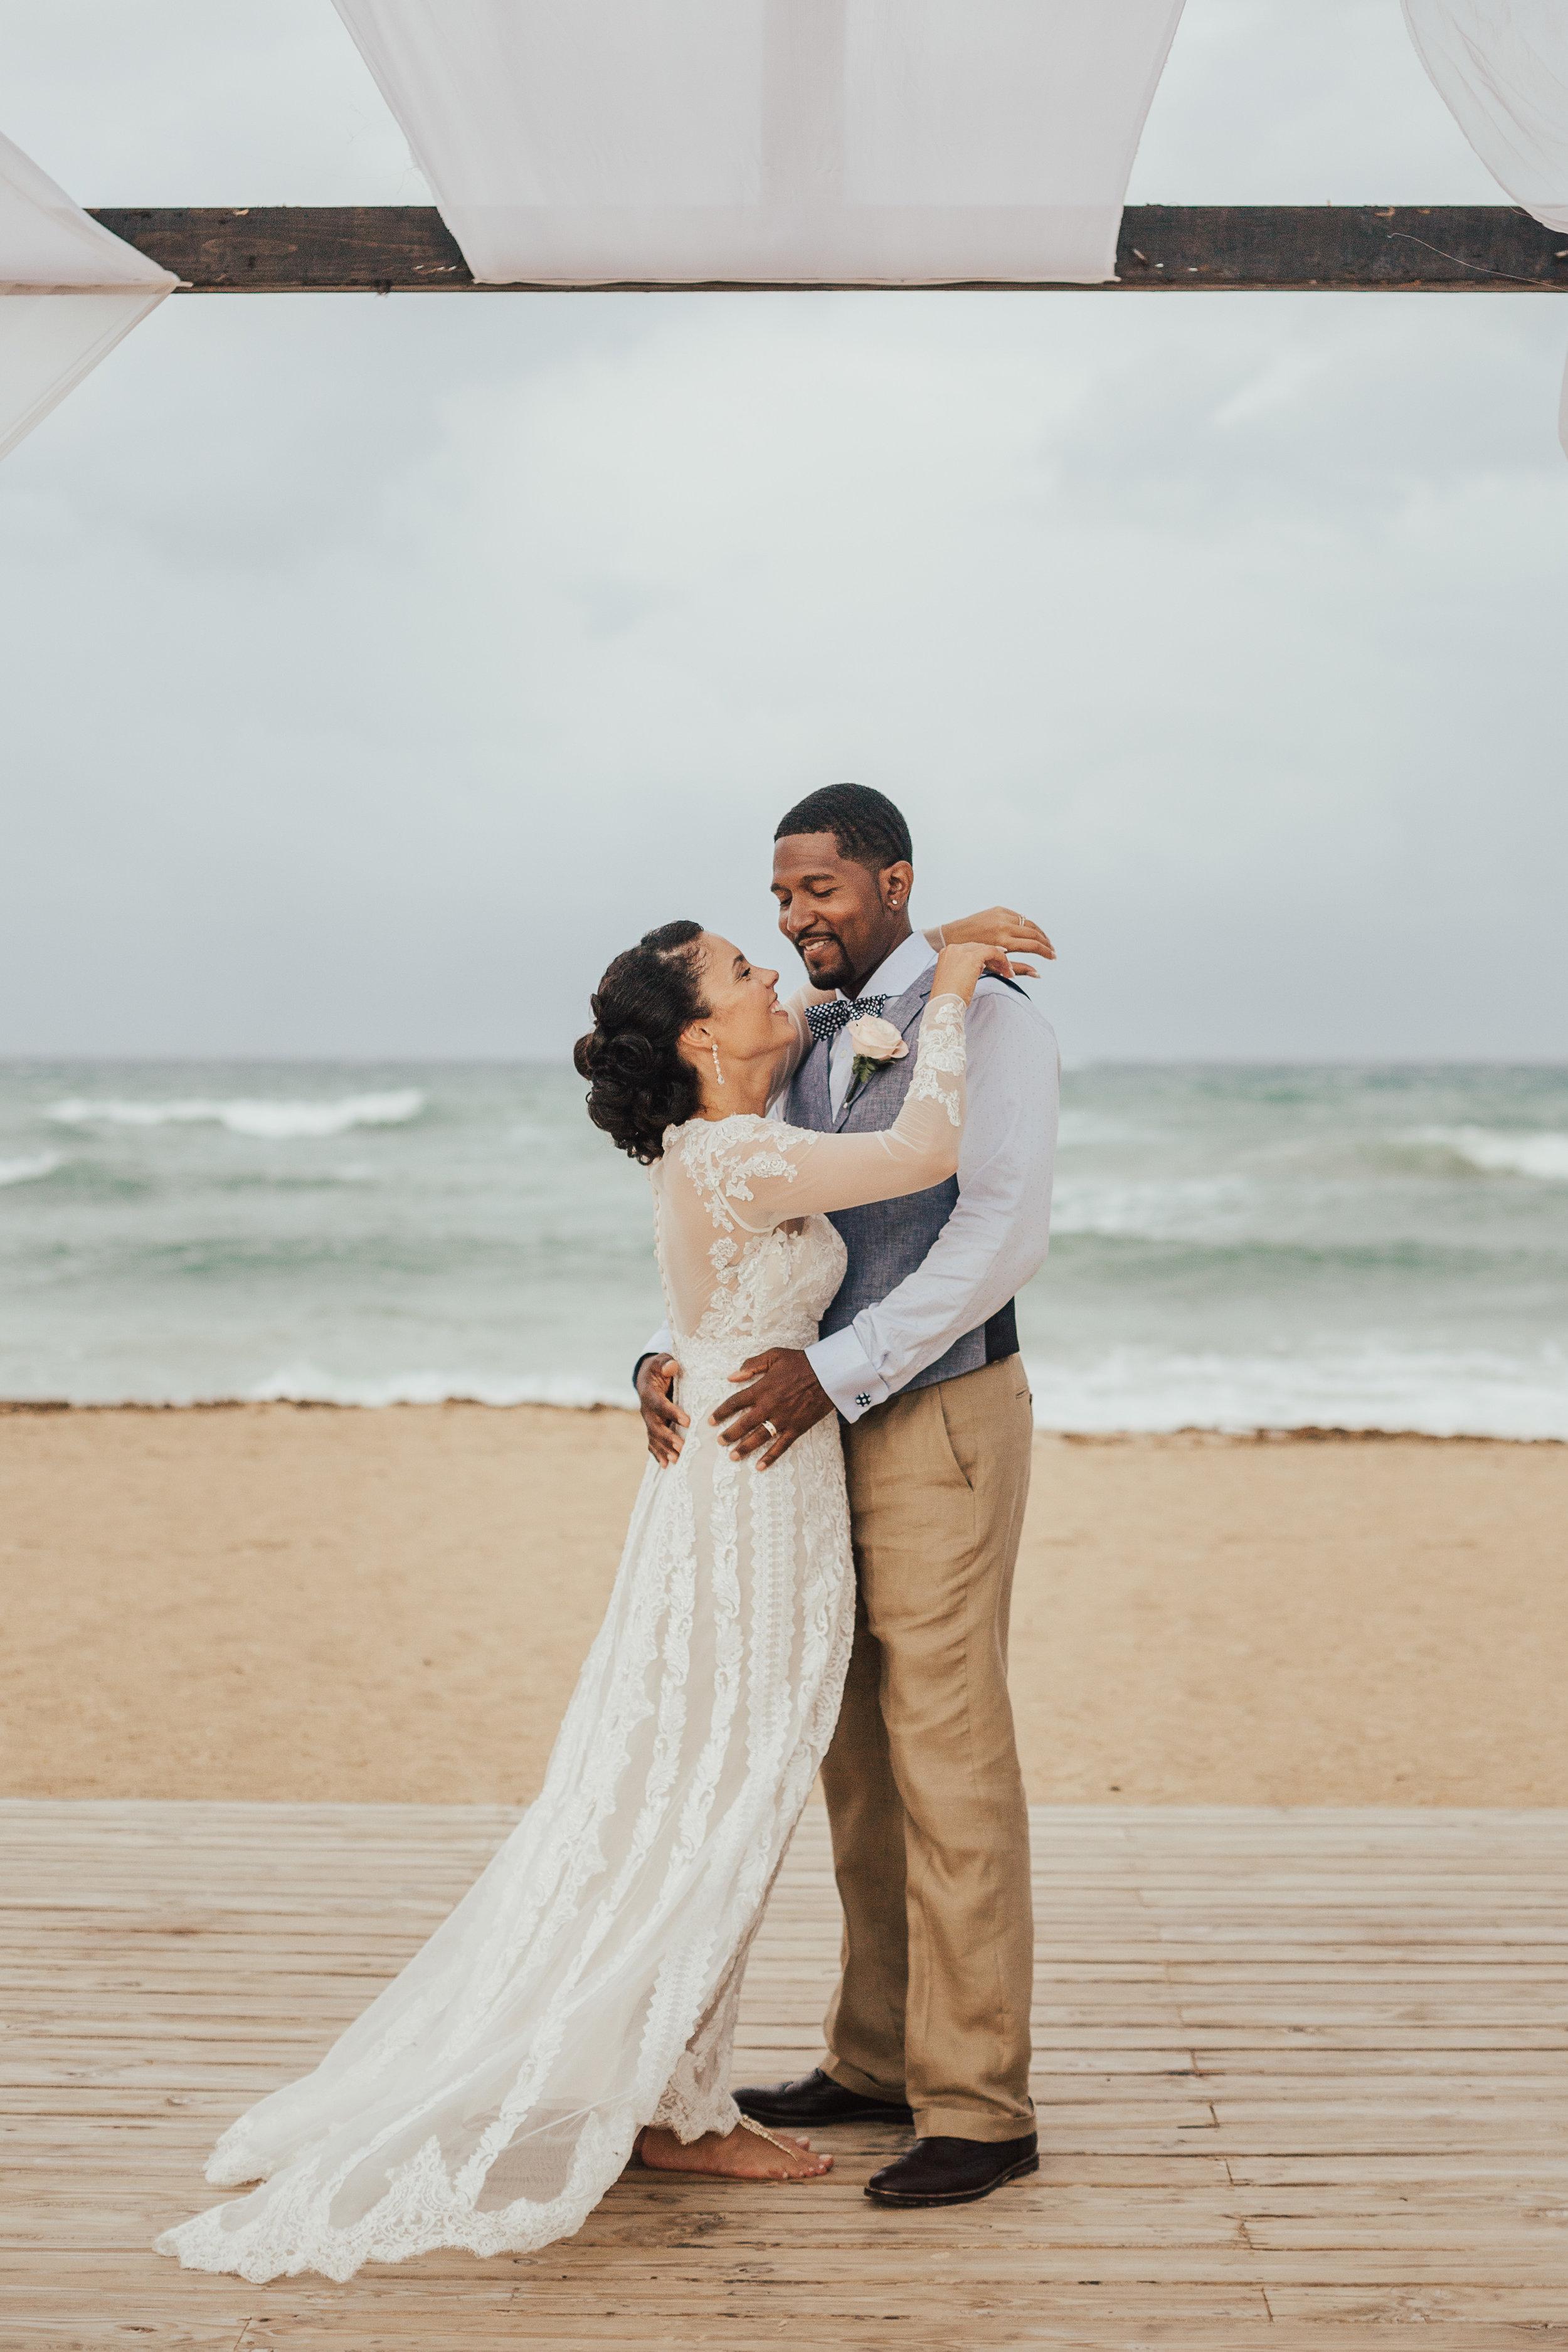 Destination-Wedding-Photographer-cleveland-wedding-photographer-elopement-photographer-beach-elopement-beach-wedding-elope